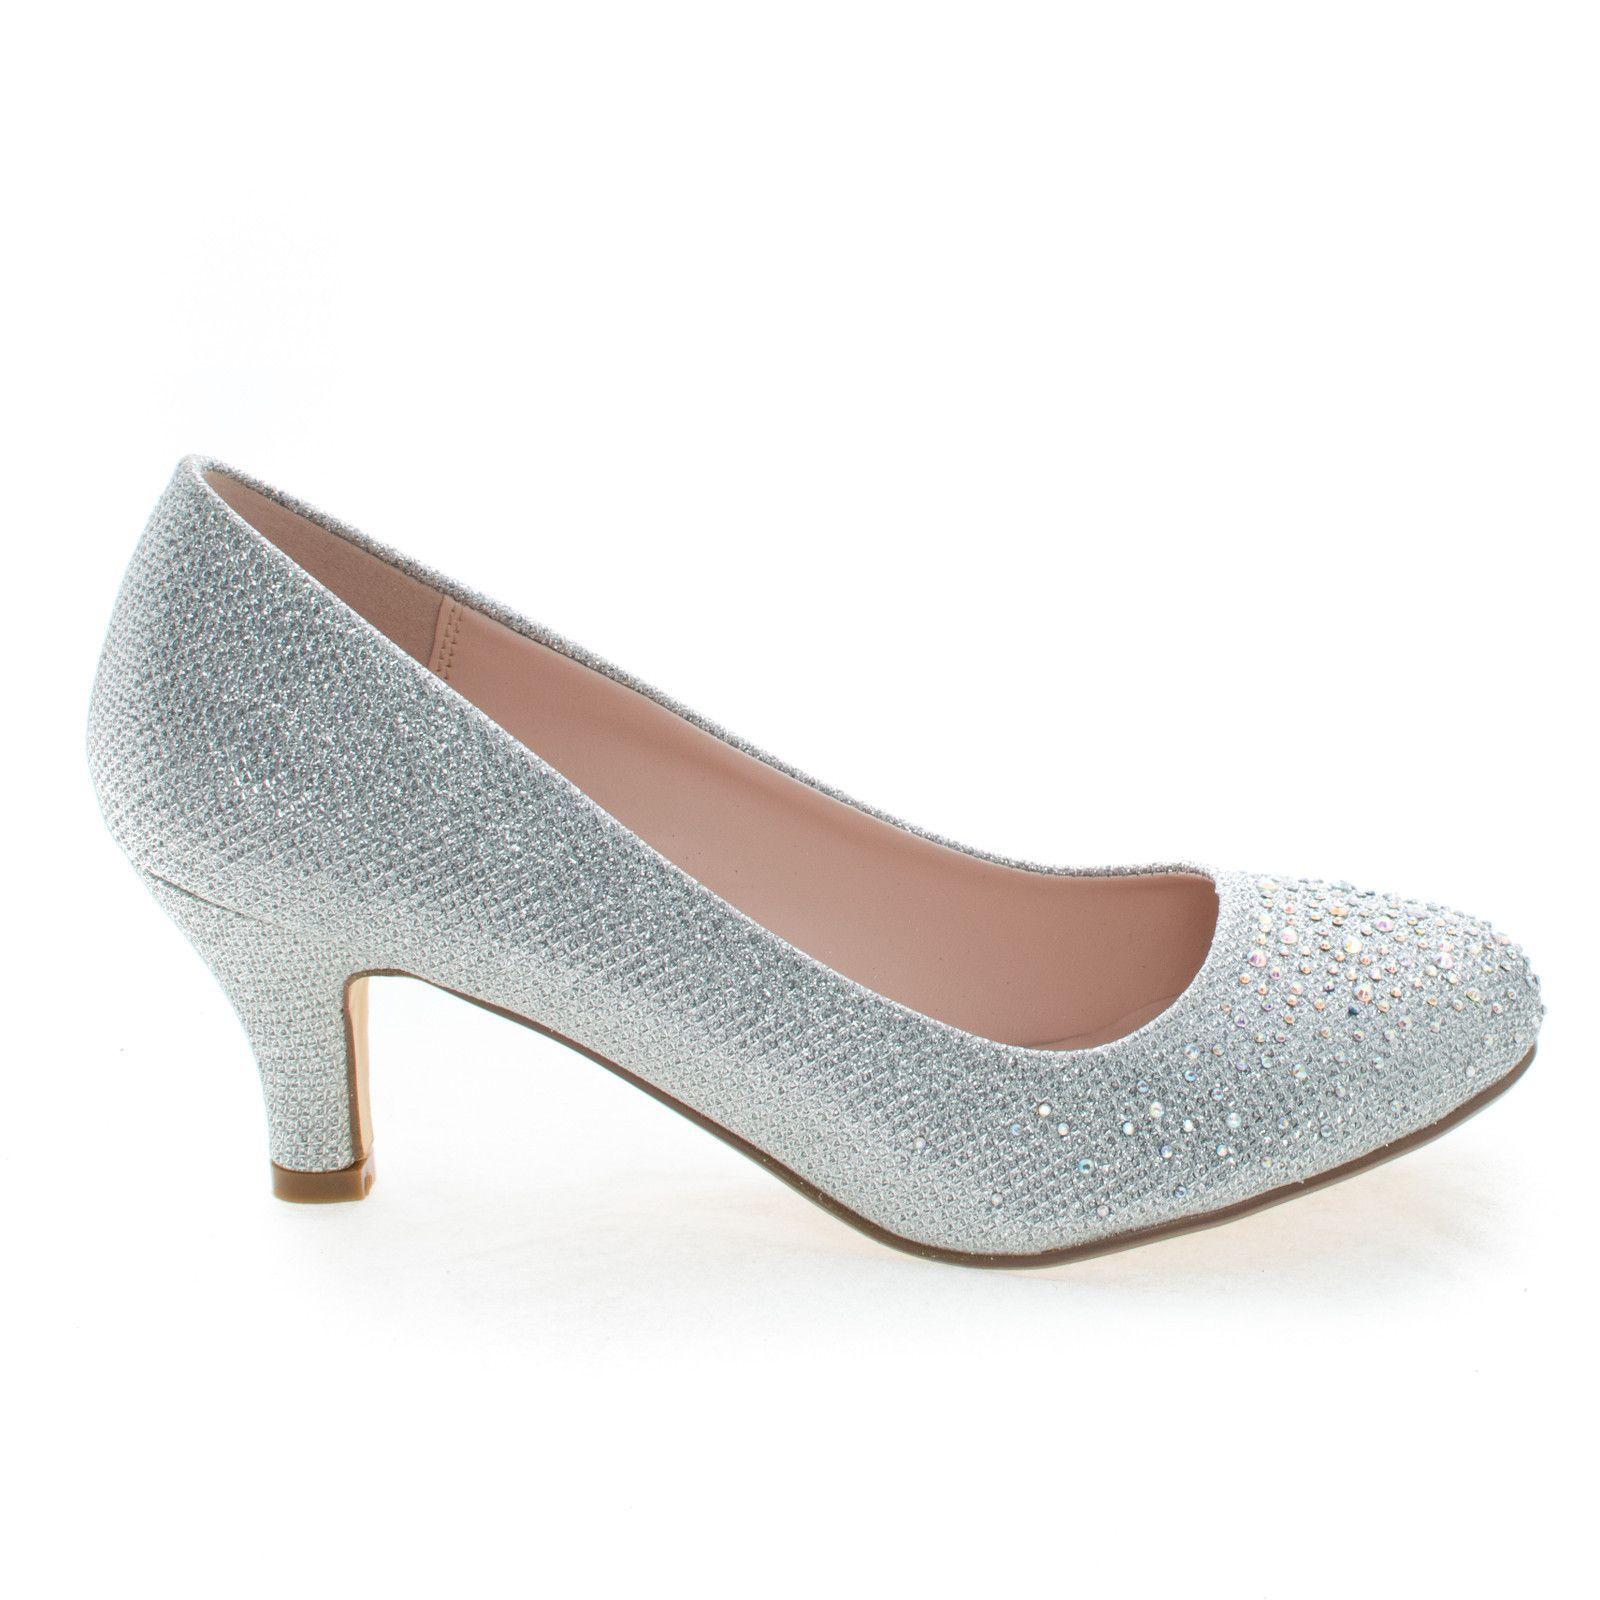 Wonda1 Silver Round Toe Low Heel Classic Dress Pump In